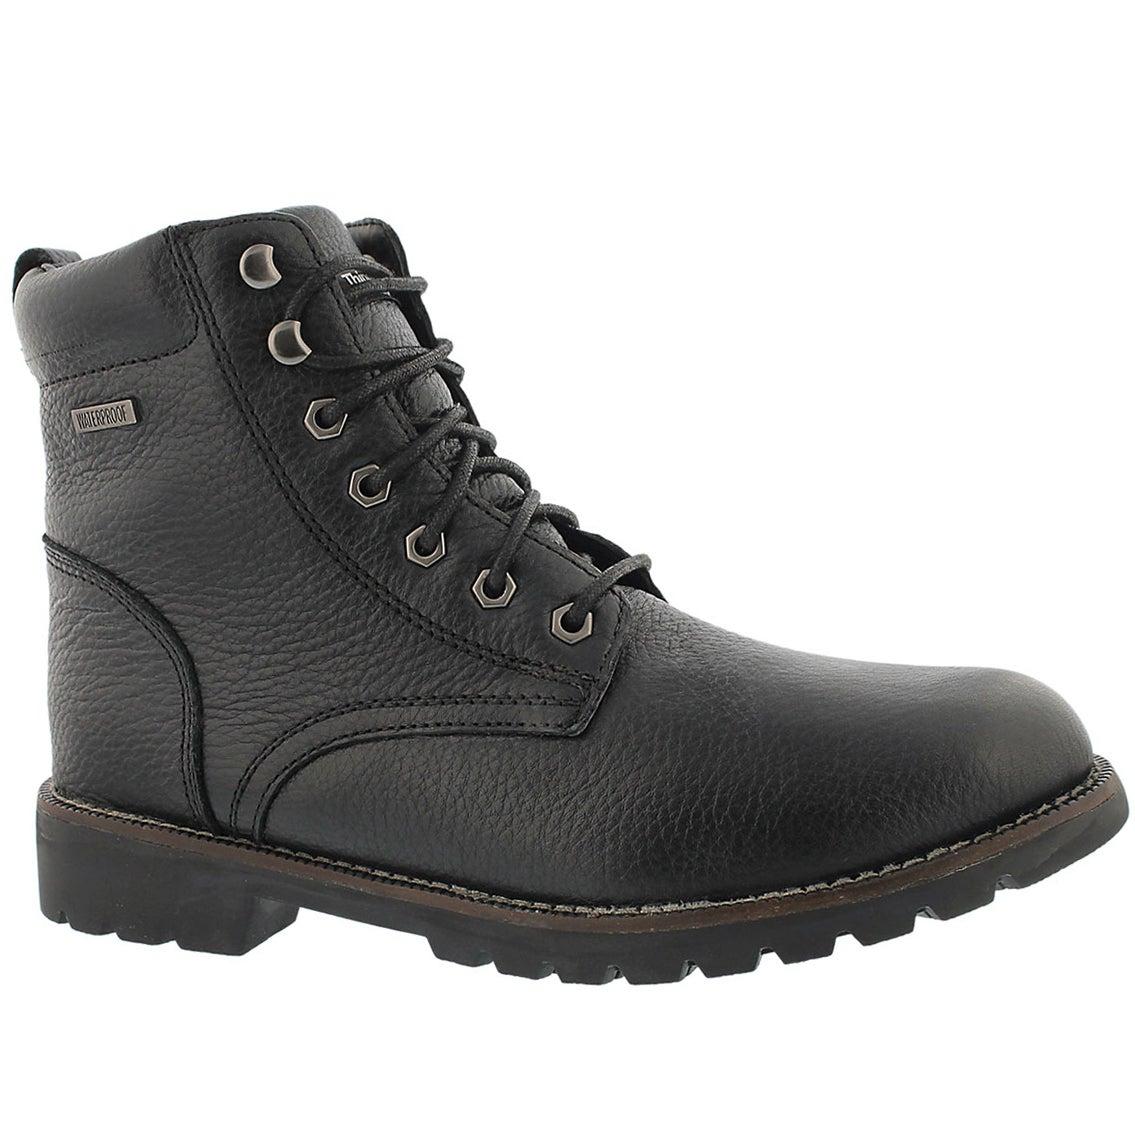 Mns Maddux blk wtpf lace-up winter boot